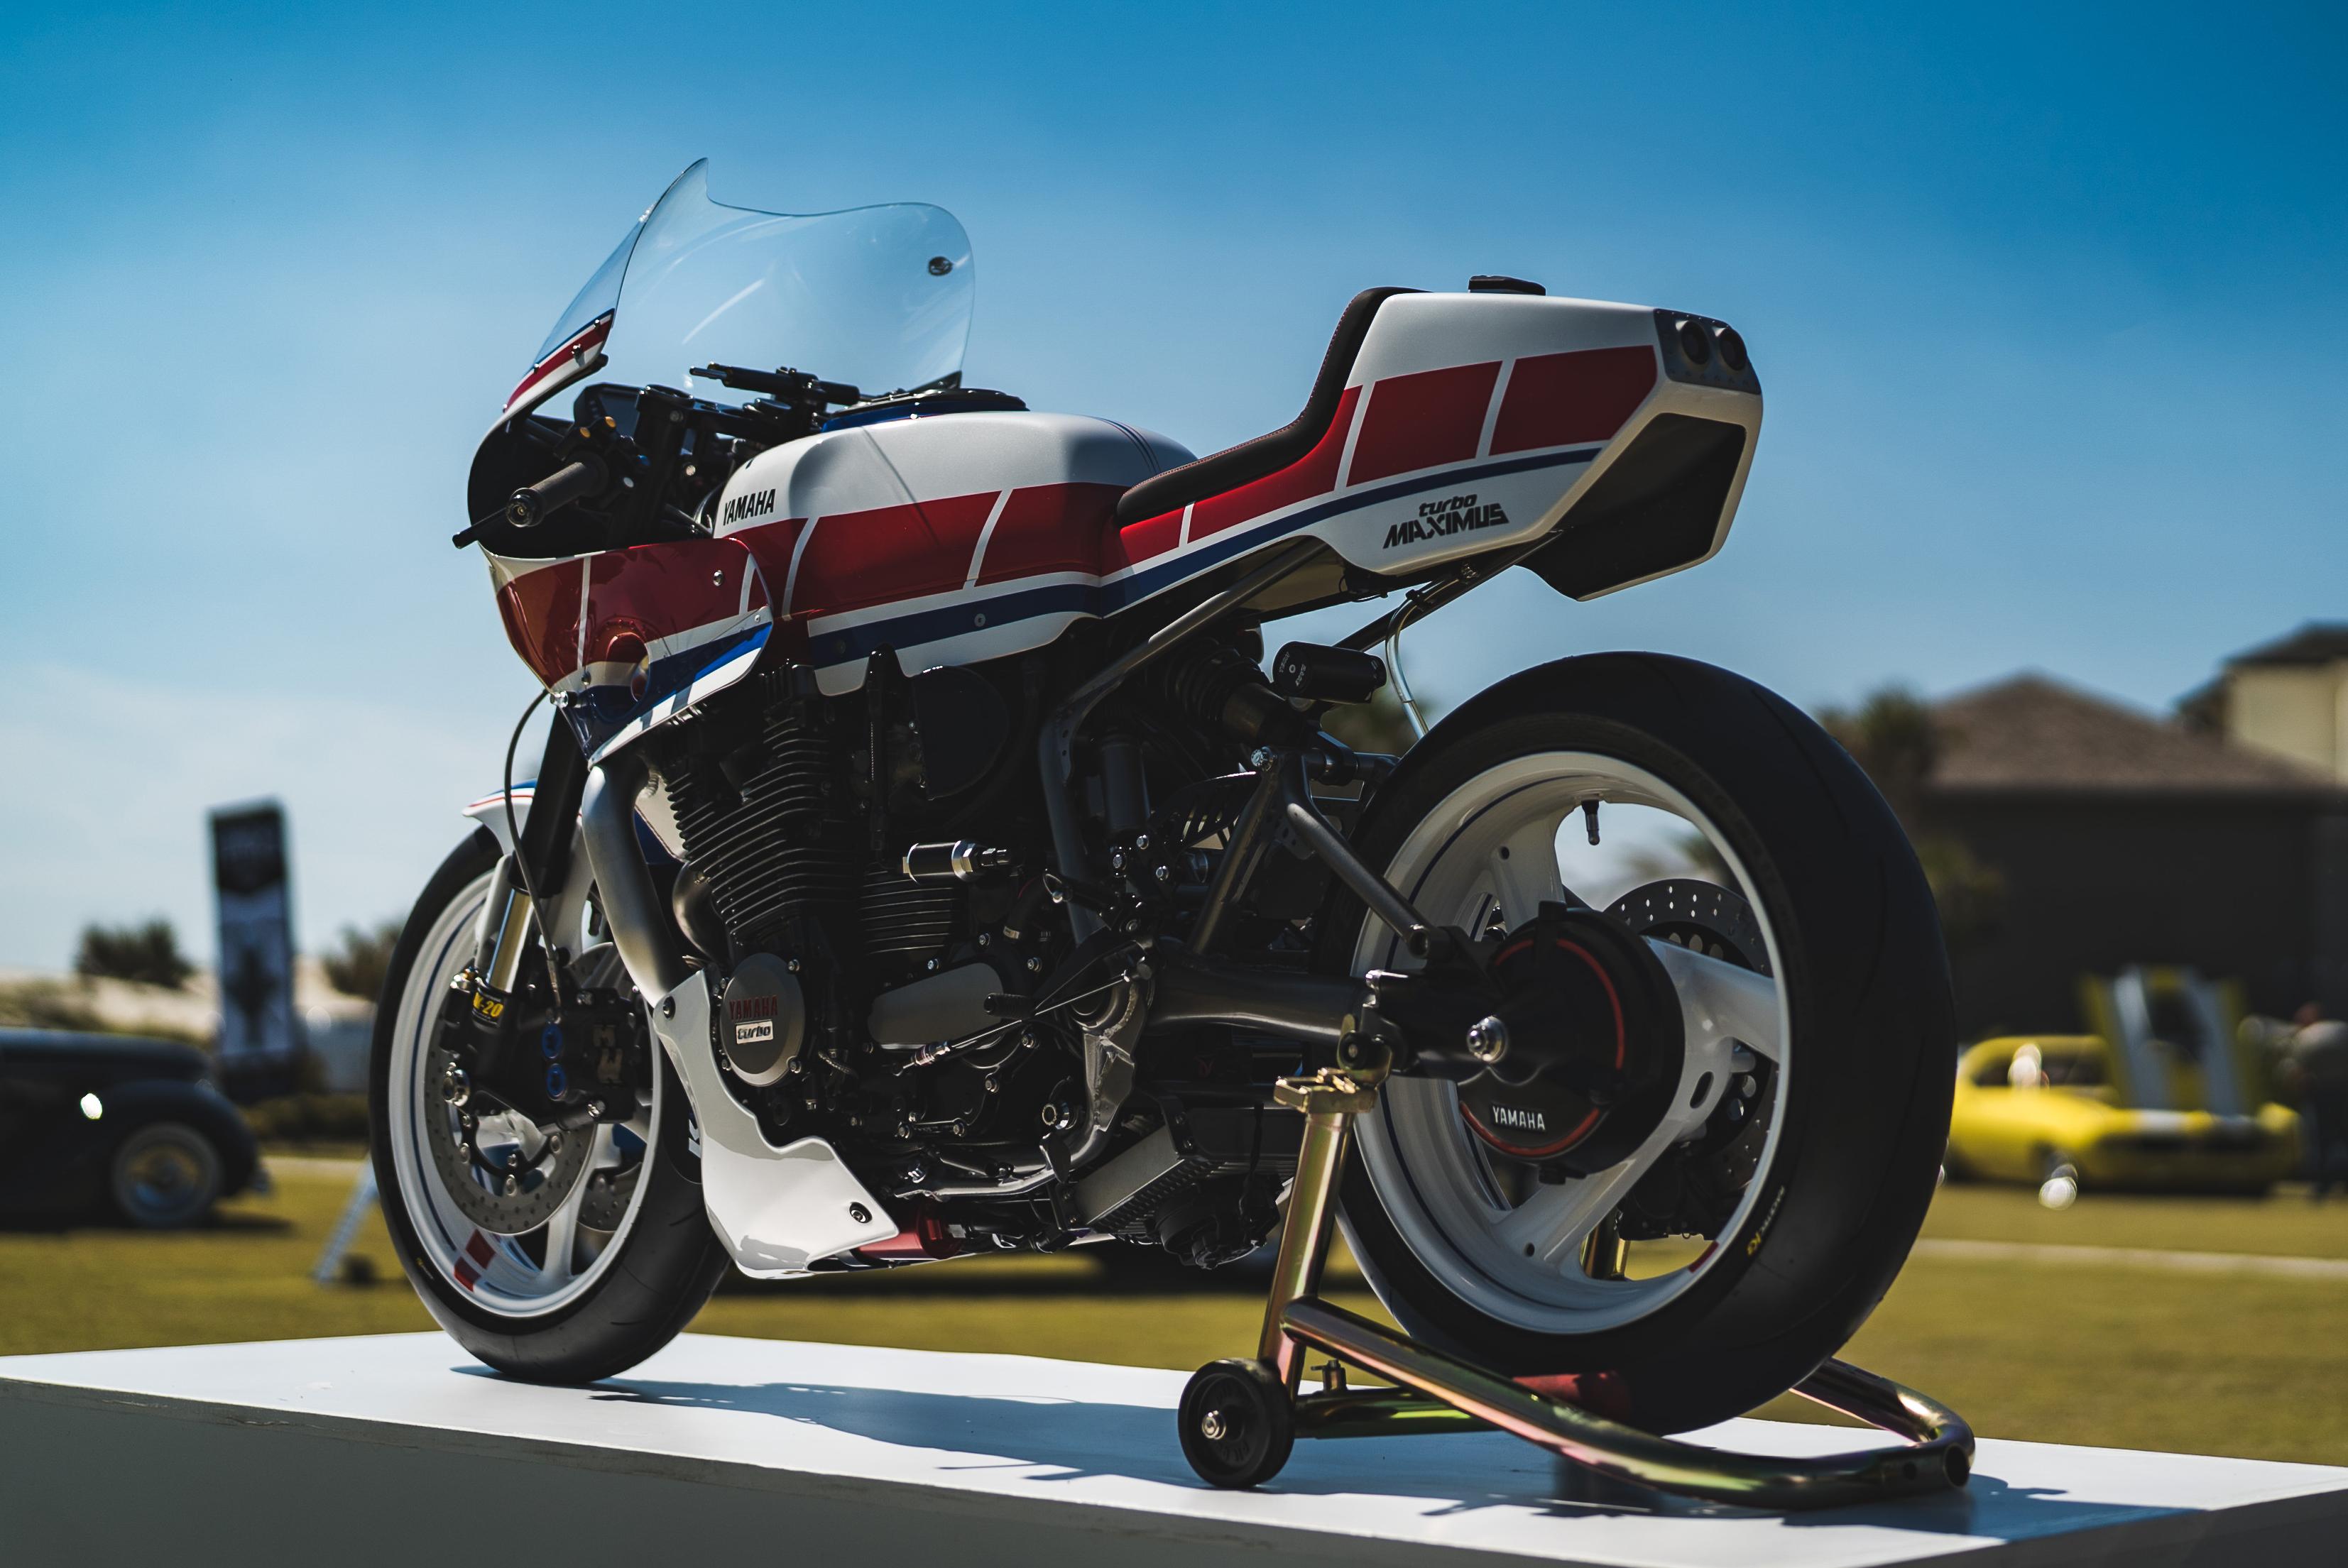 turbo-charged Yamaha XJ750 Maxim